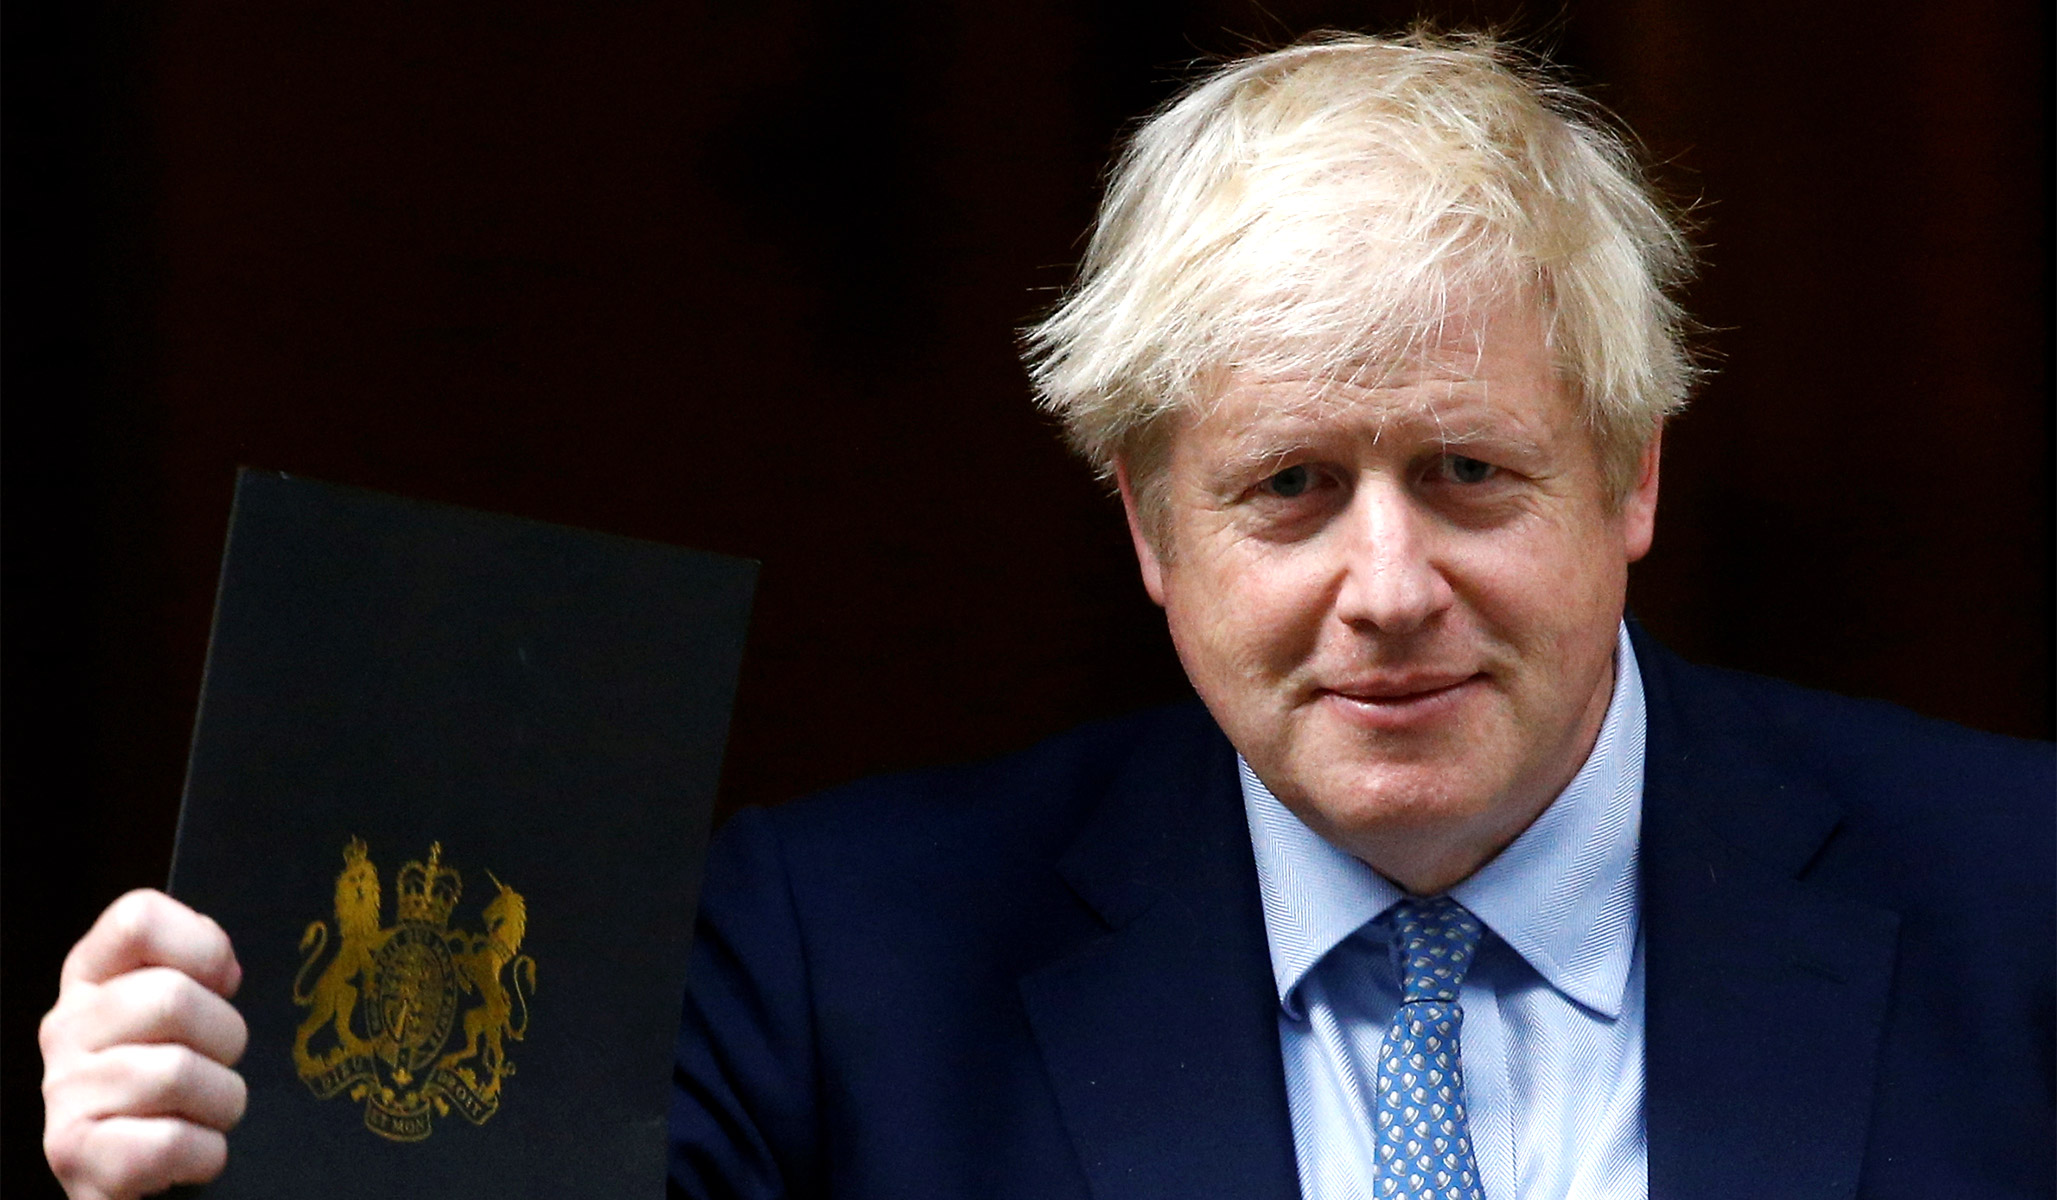 Boris Johnson's Media Blunder, on Health Care, Is Very Ill-Timed